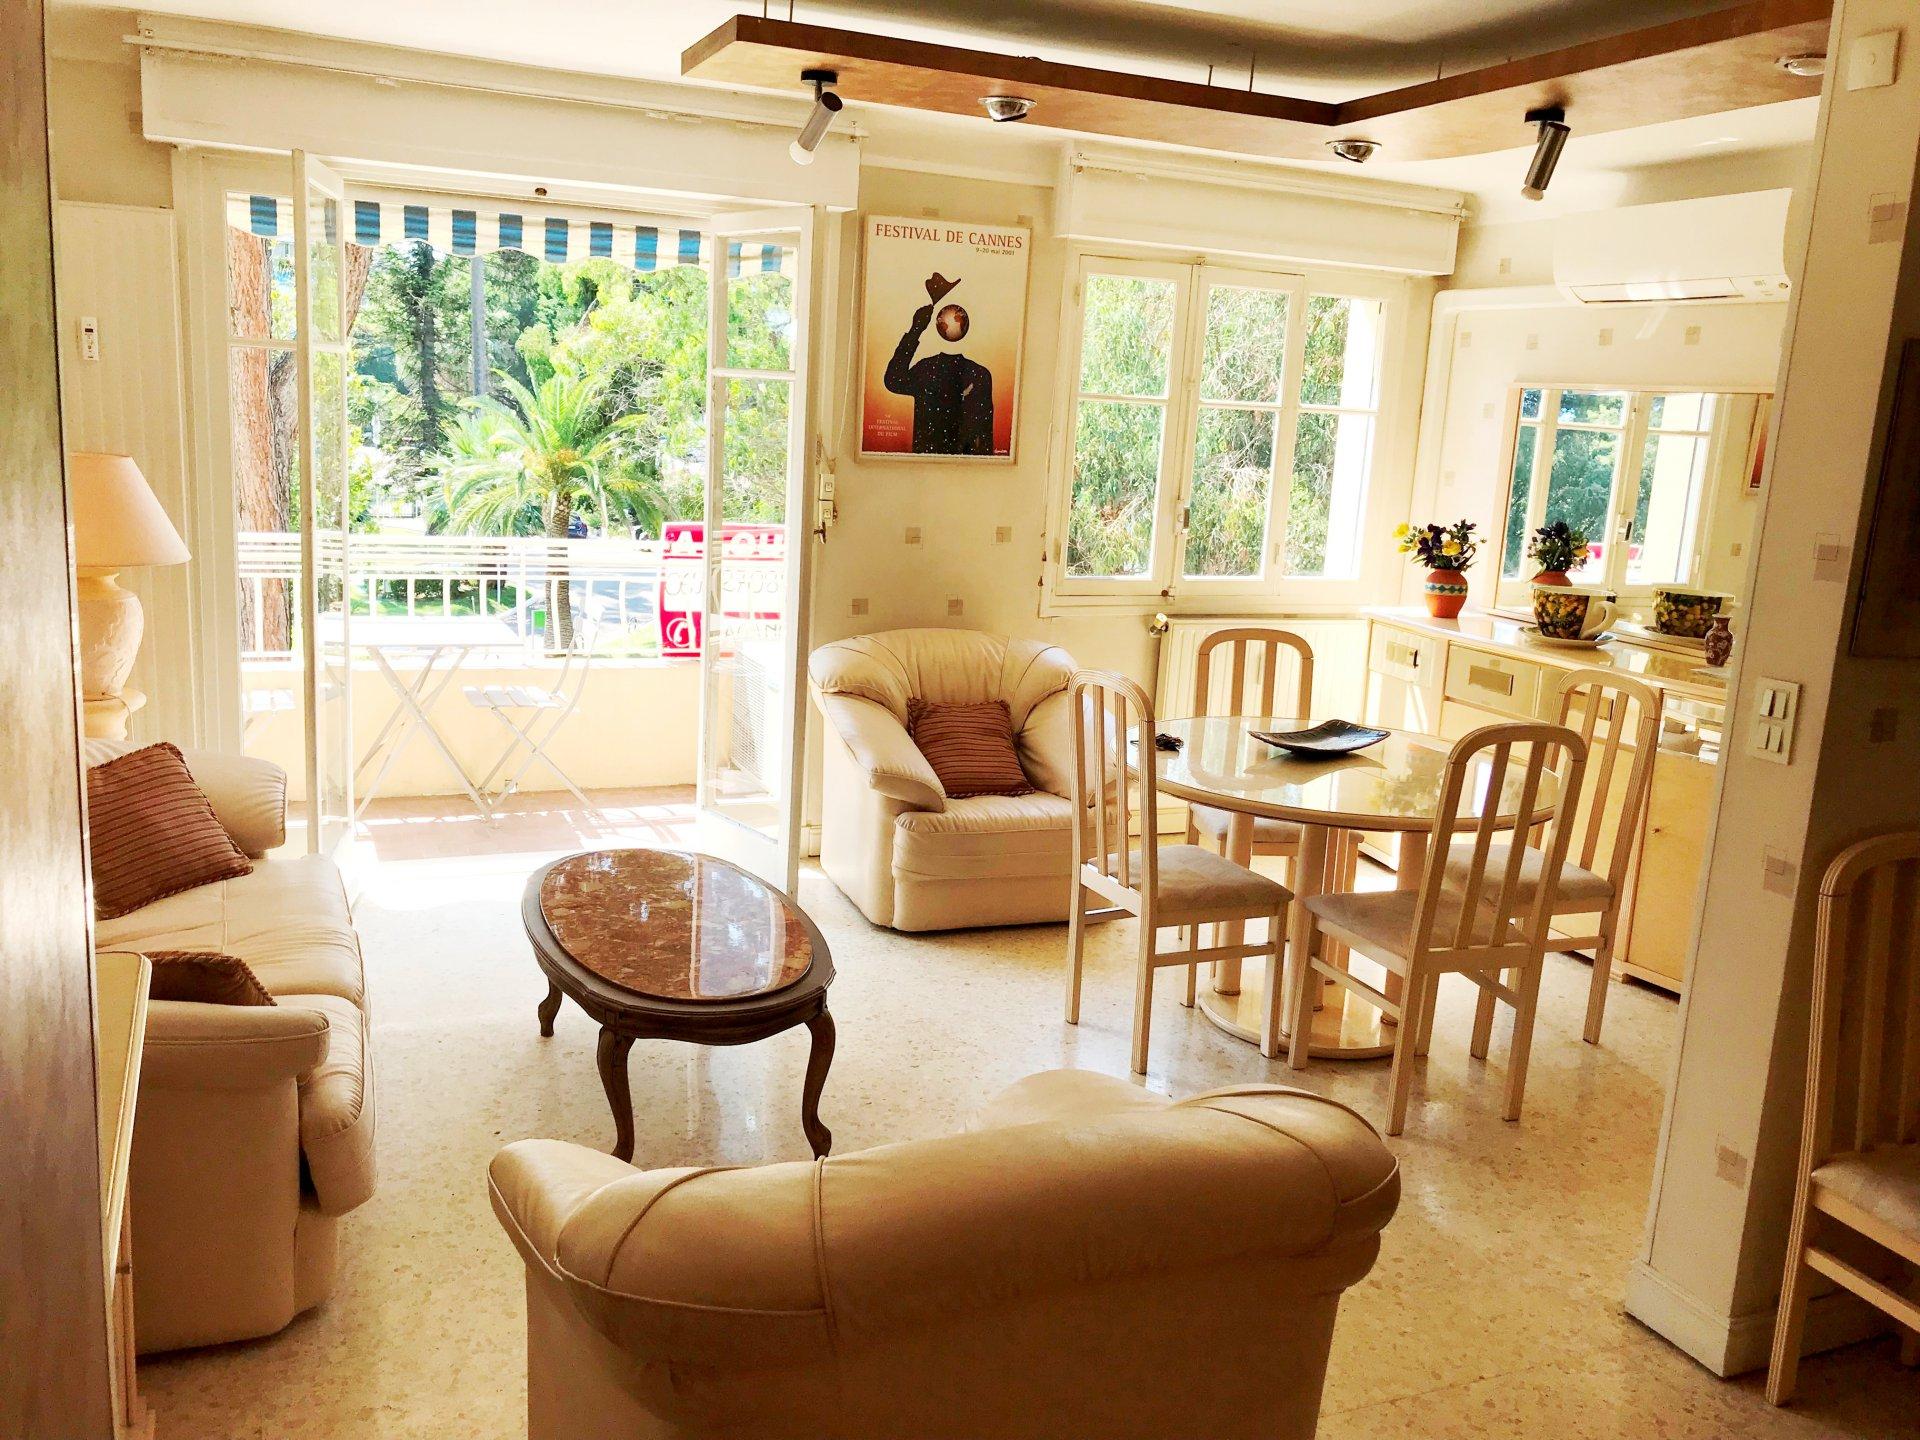 Vendita Appartamento - Cannes Plages du midi